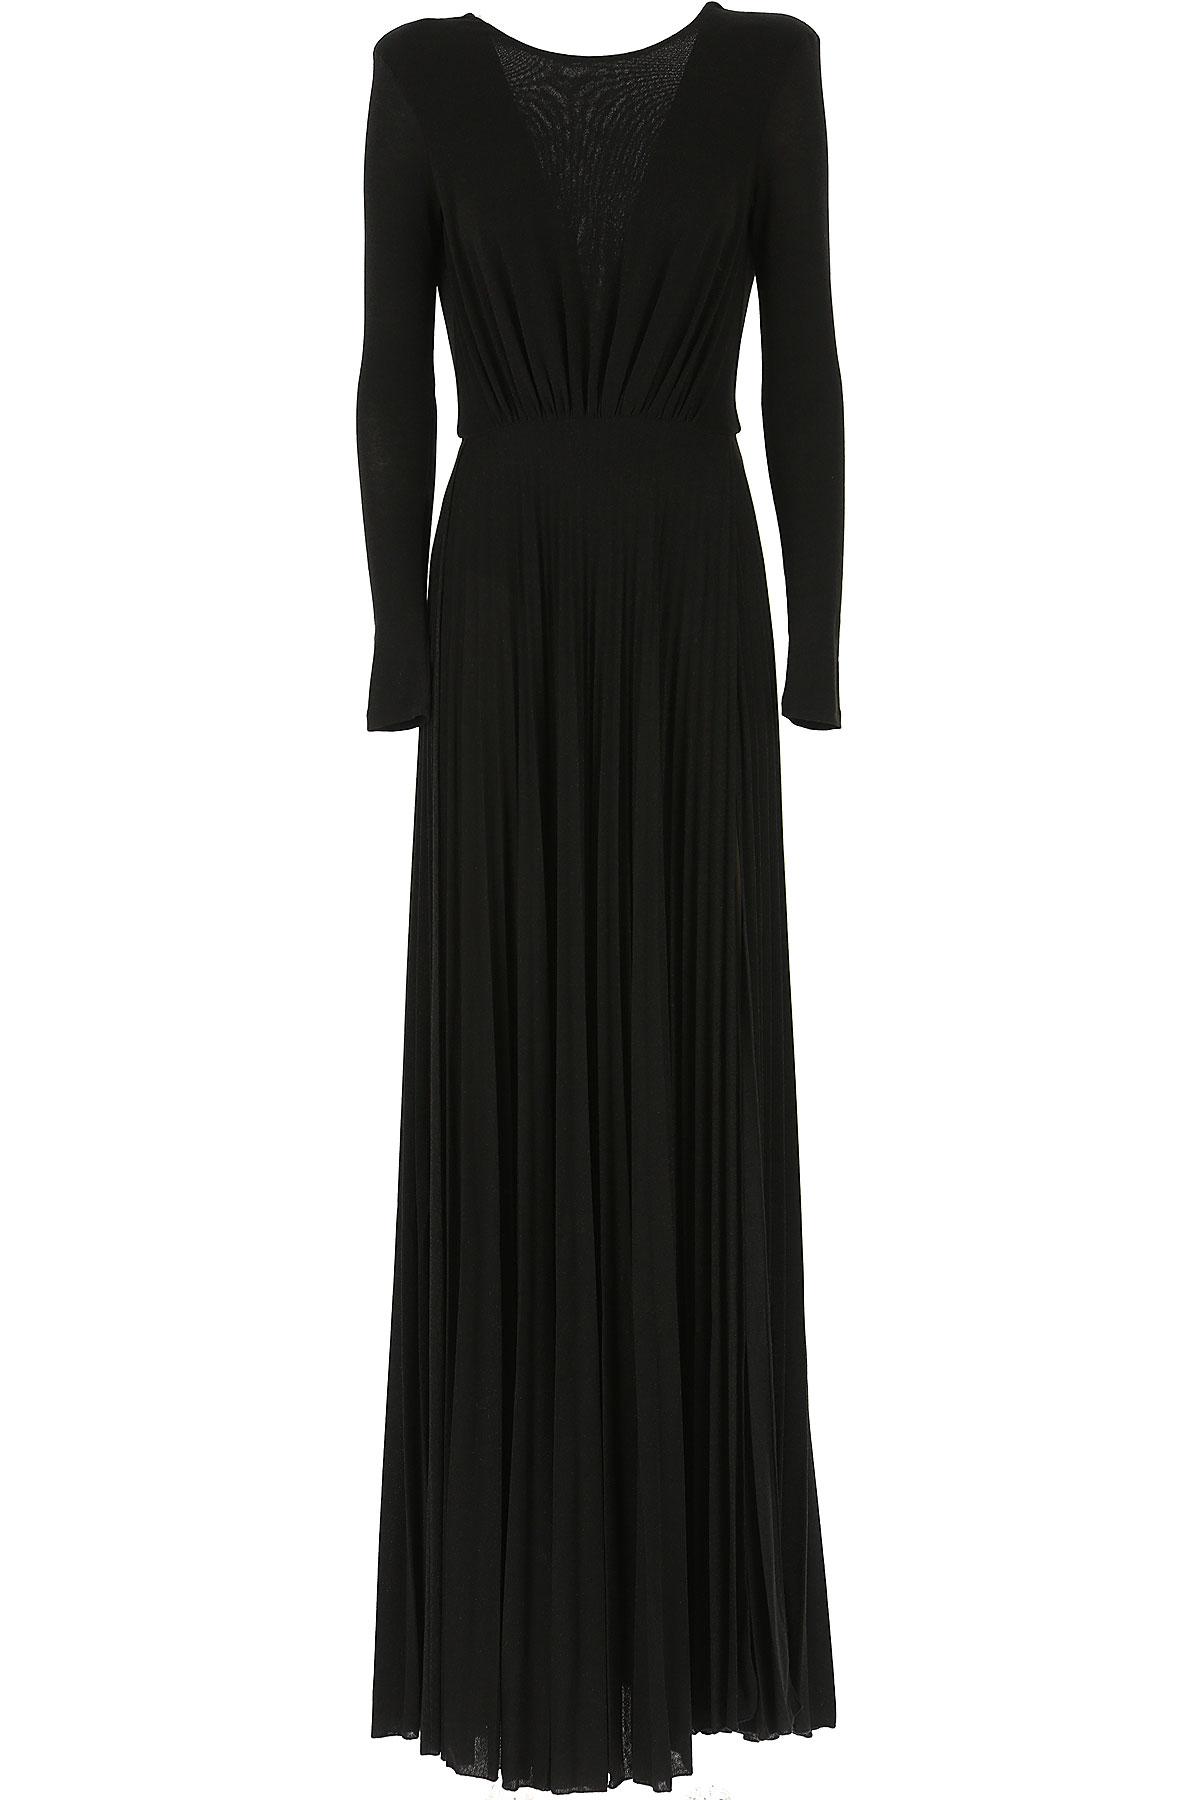 Elisabetta Franchi Dress for Women, Evening Cocktail Party On Sale, Black, viscosa, 2019, 4 6